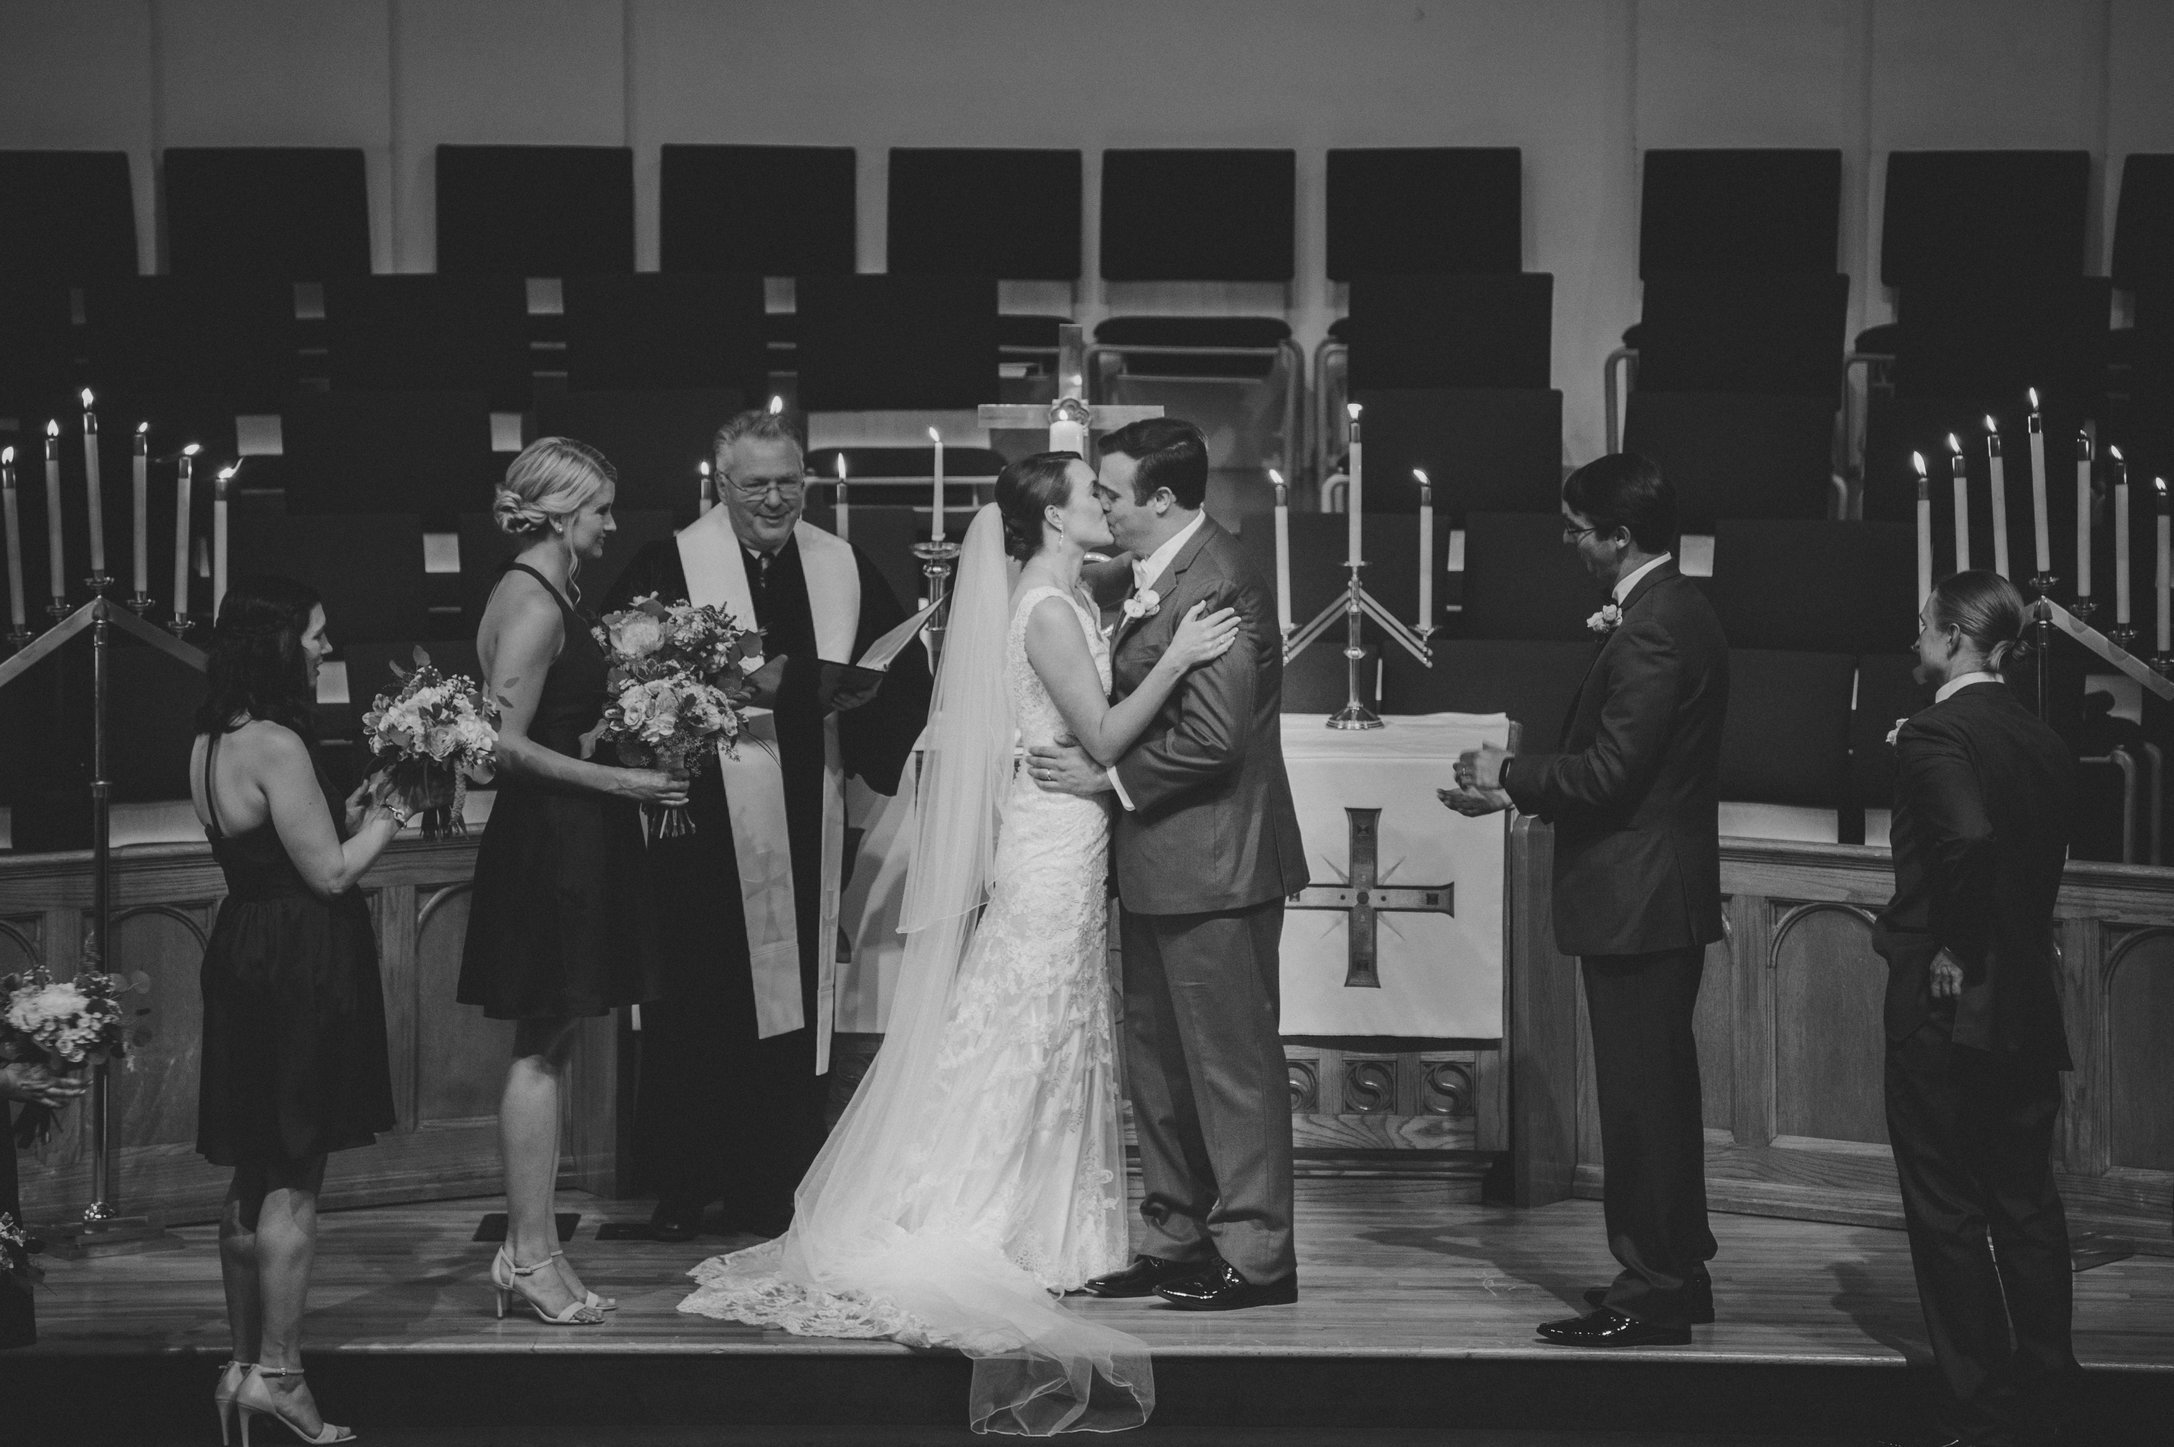 SandC-wedding-223.jpg